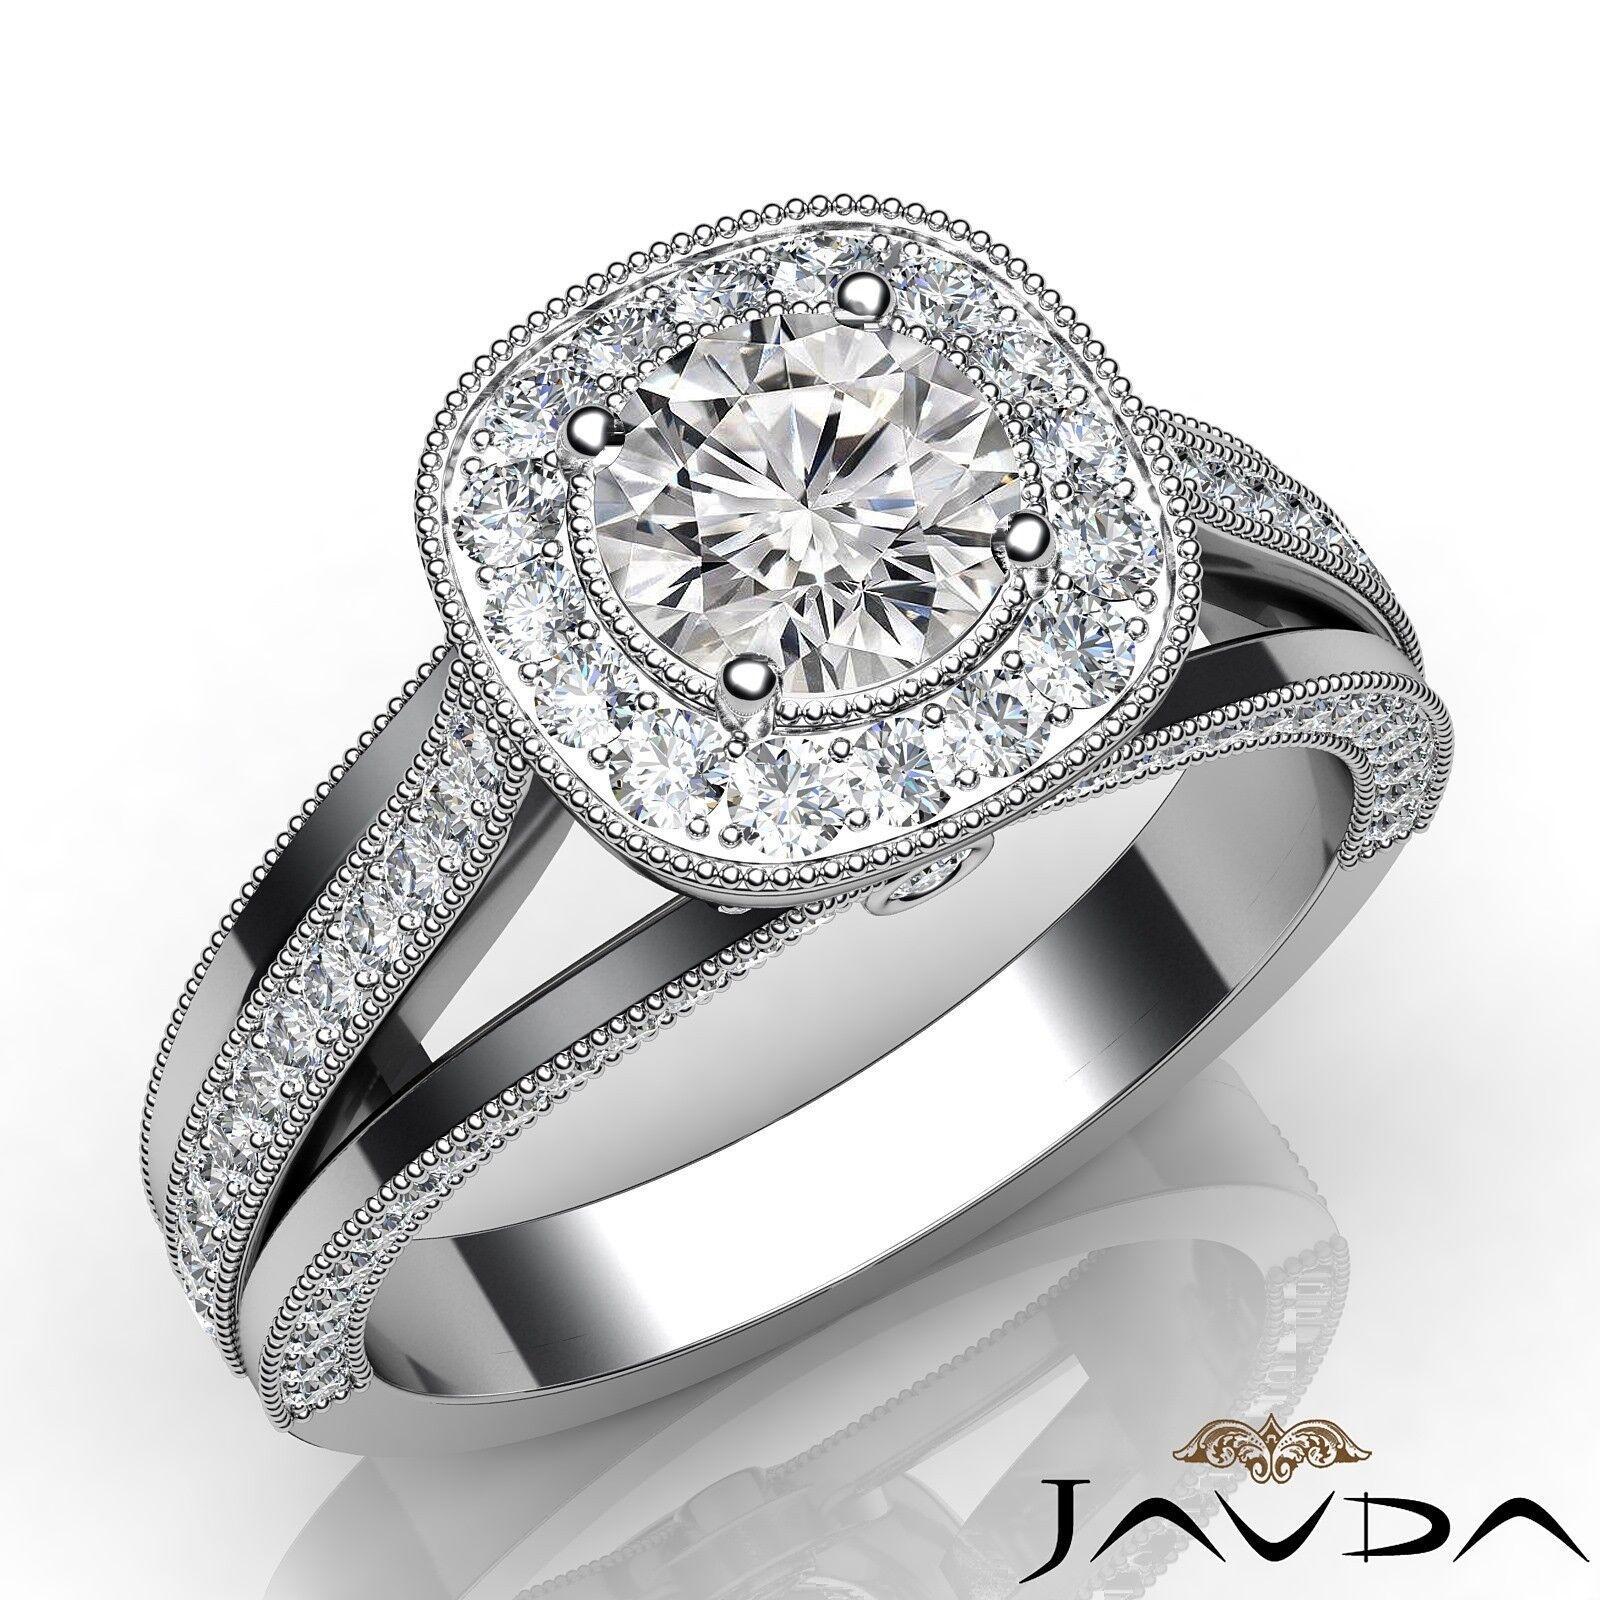 1.6ctw Bridge Accent Round Diamond Engagement Ring GIA E-VVS2 White Gold Rings